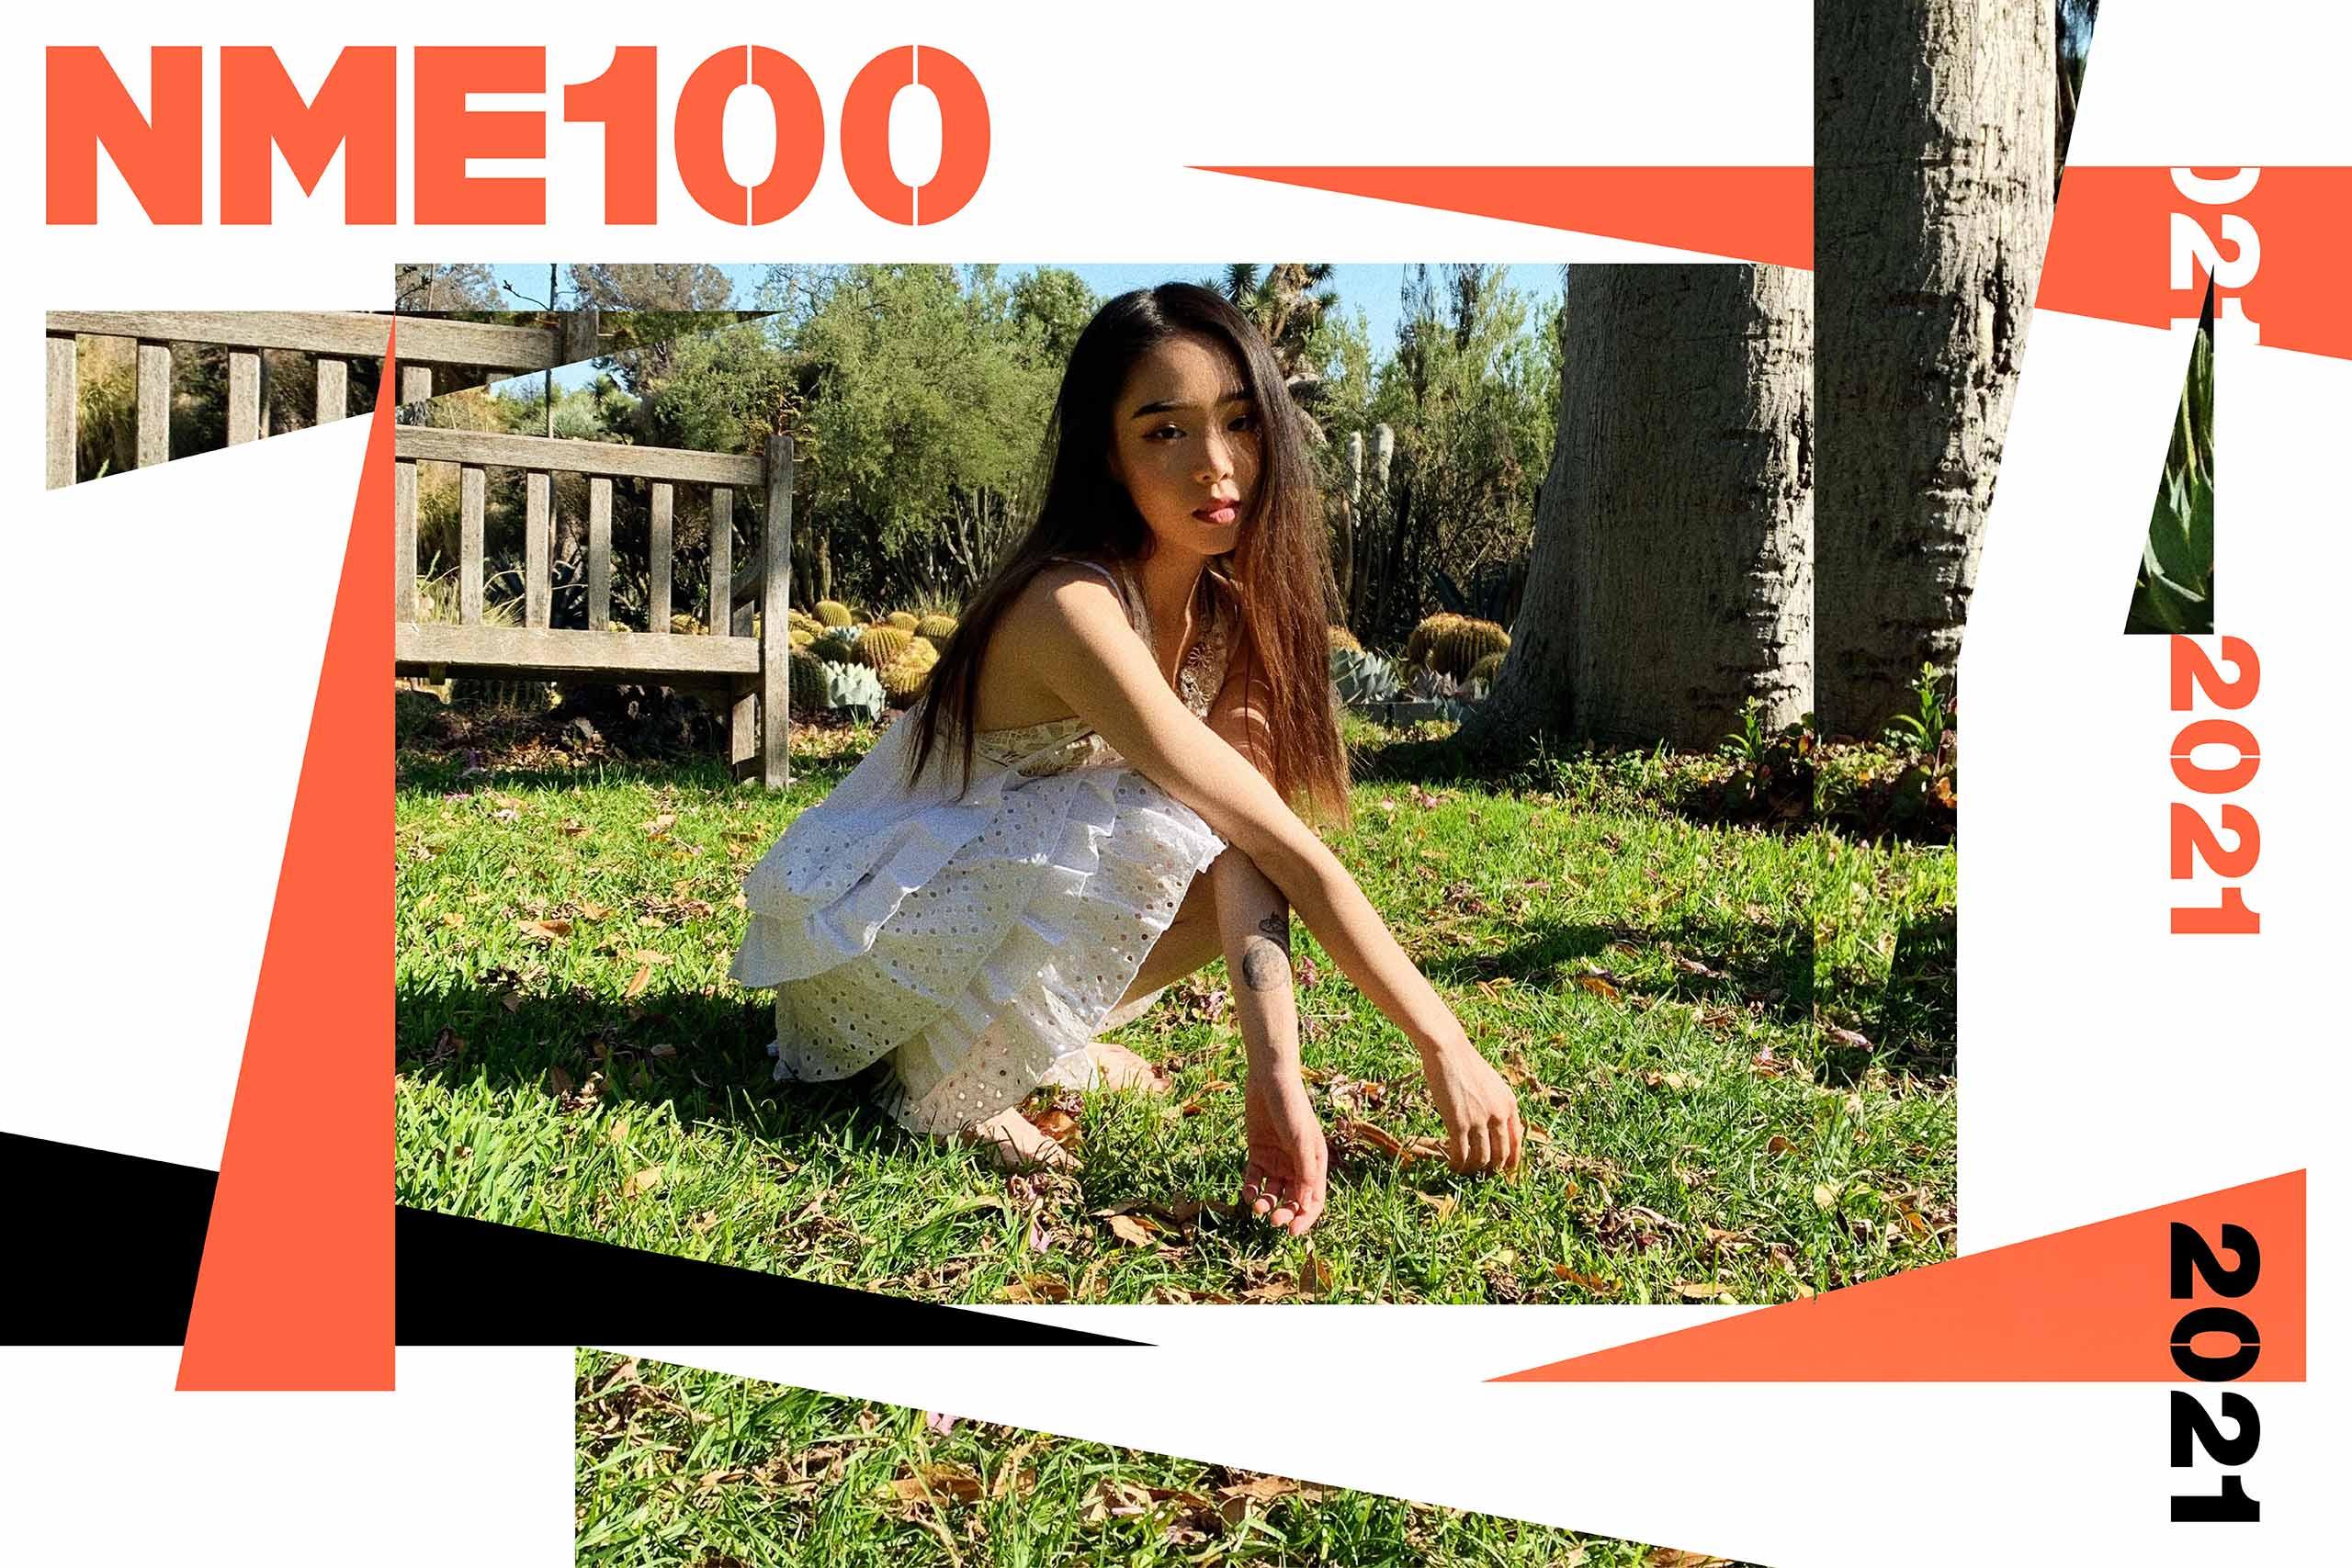 NME 100 demie cao